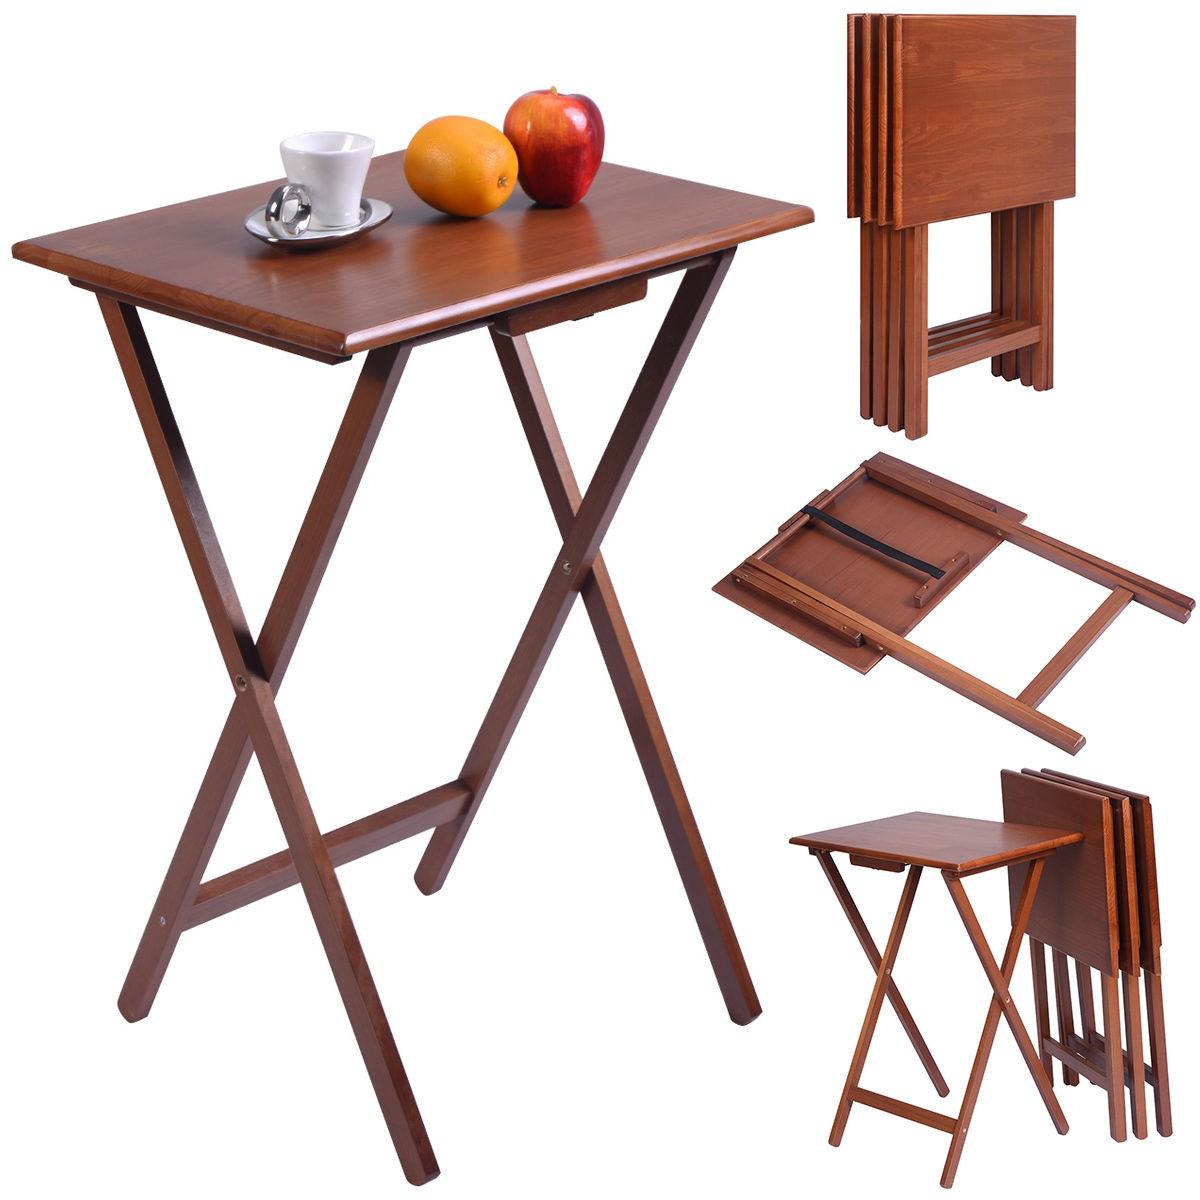 New Set Of 4 Portable Wood Tv Table Folding Tray Desk Serving Furniture Walnut